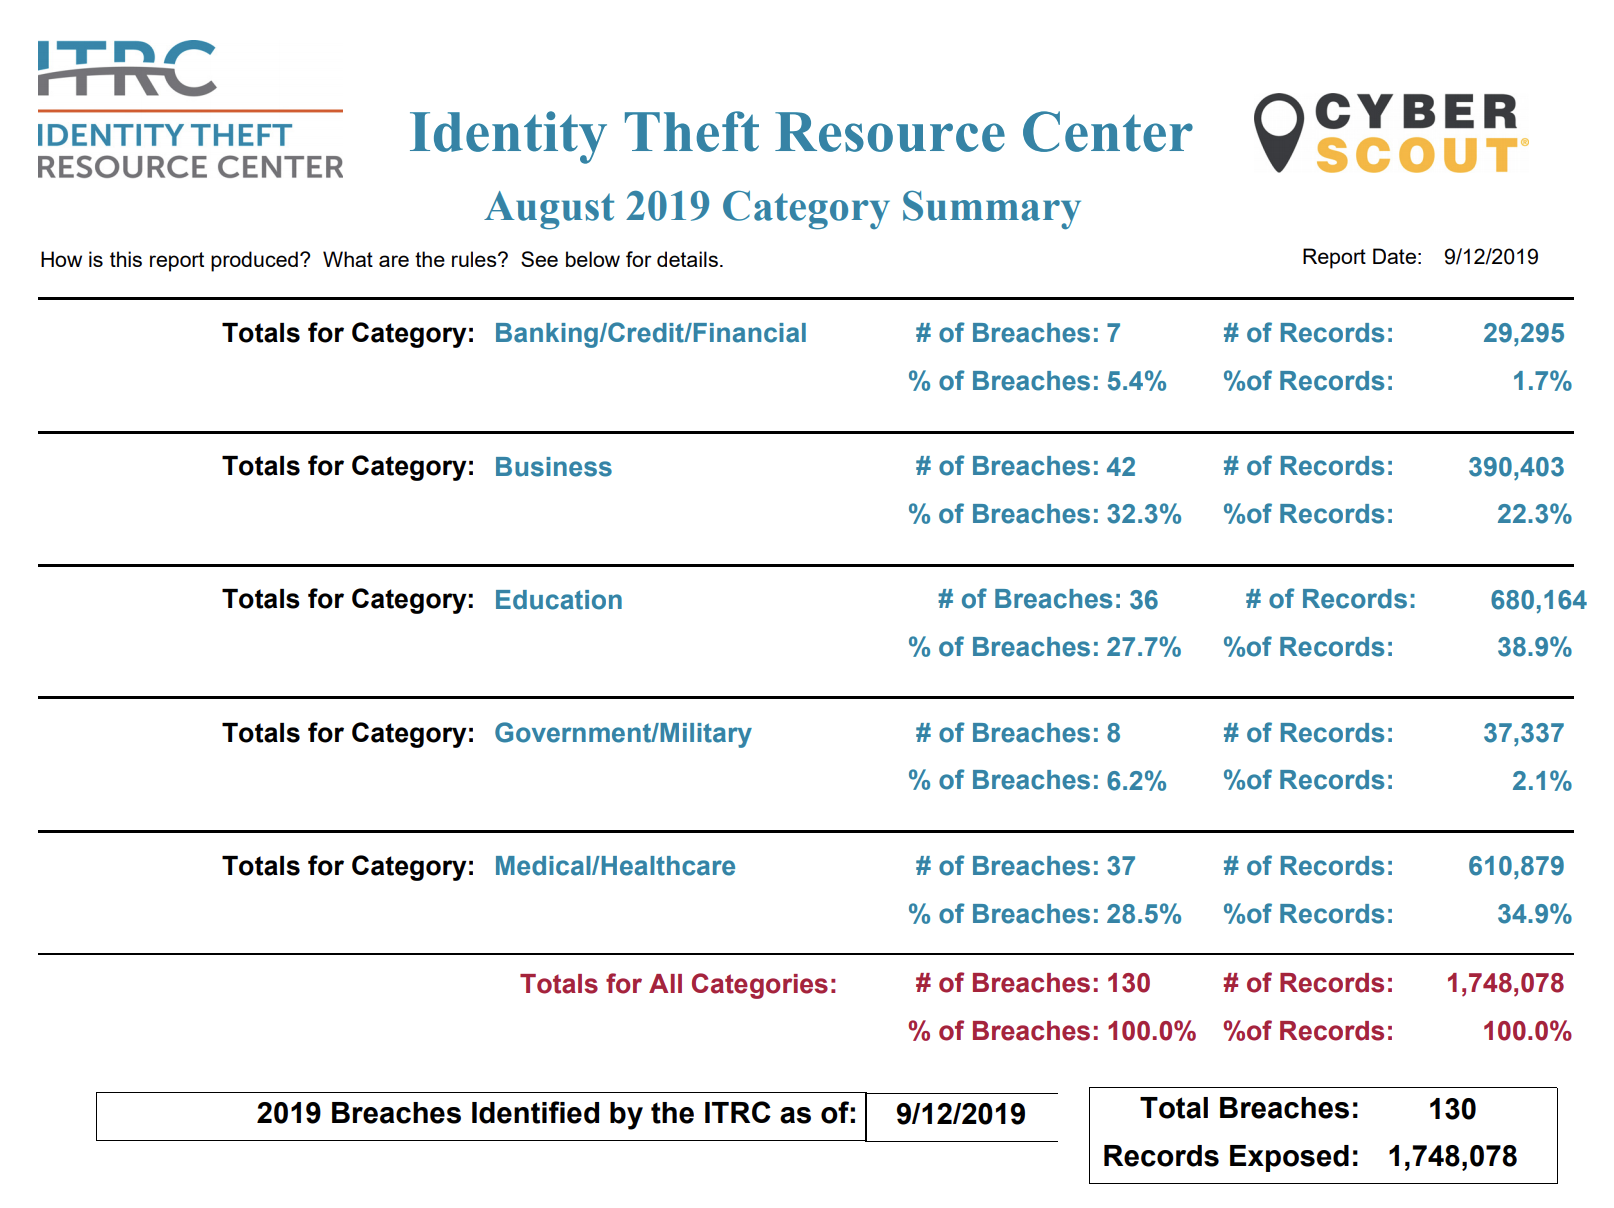 Data_Breach_Stats_August2019